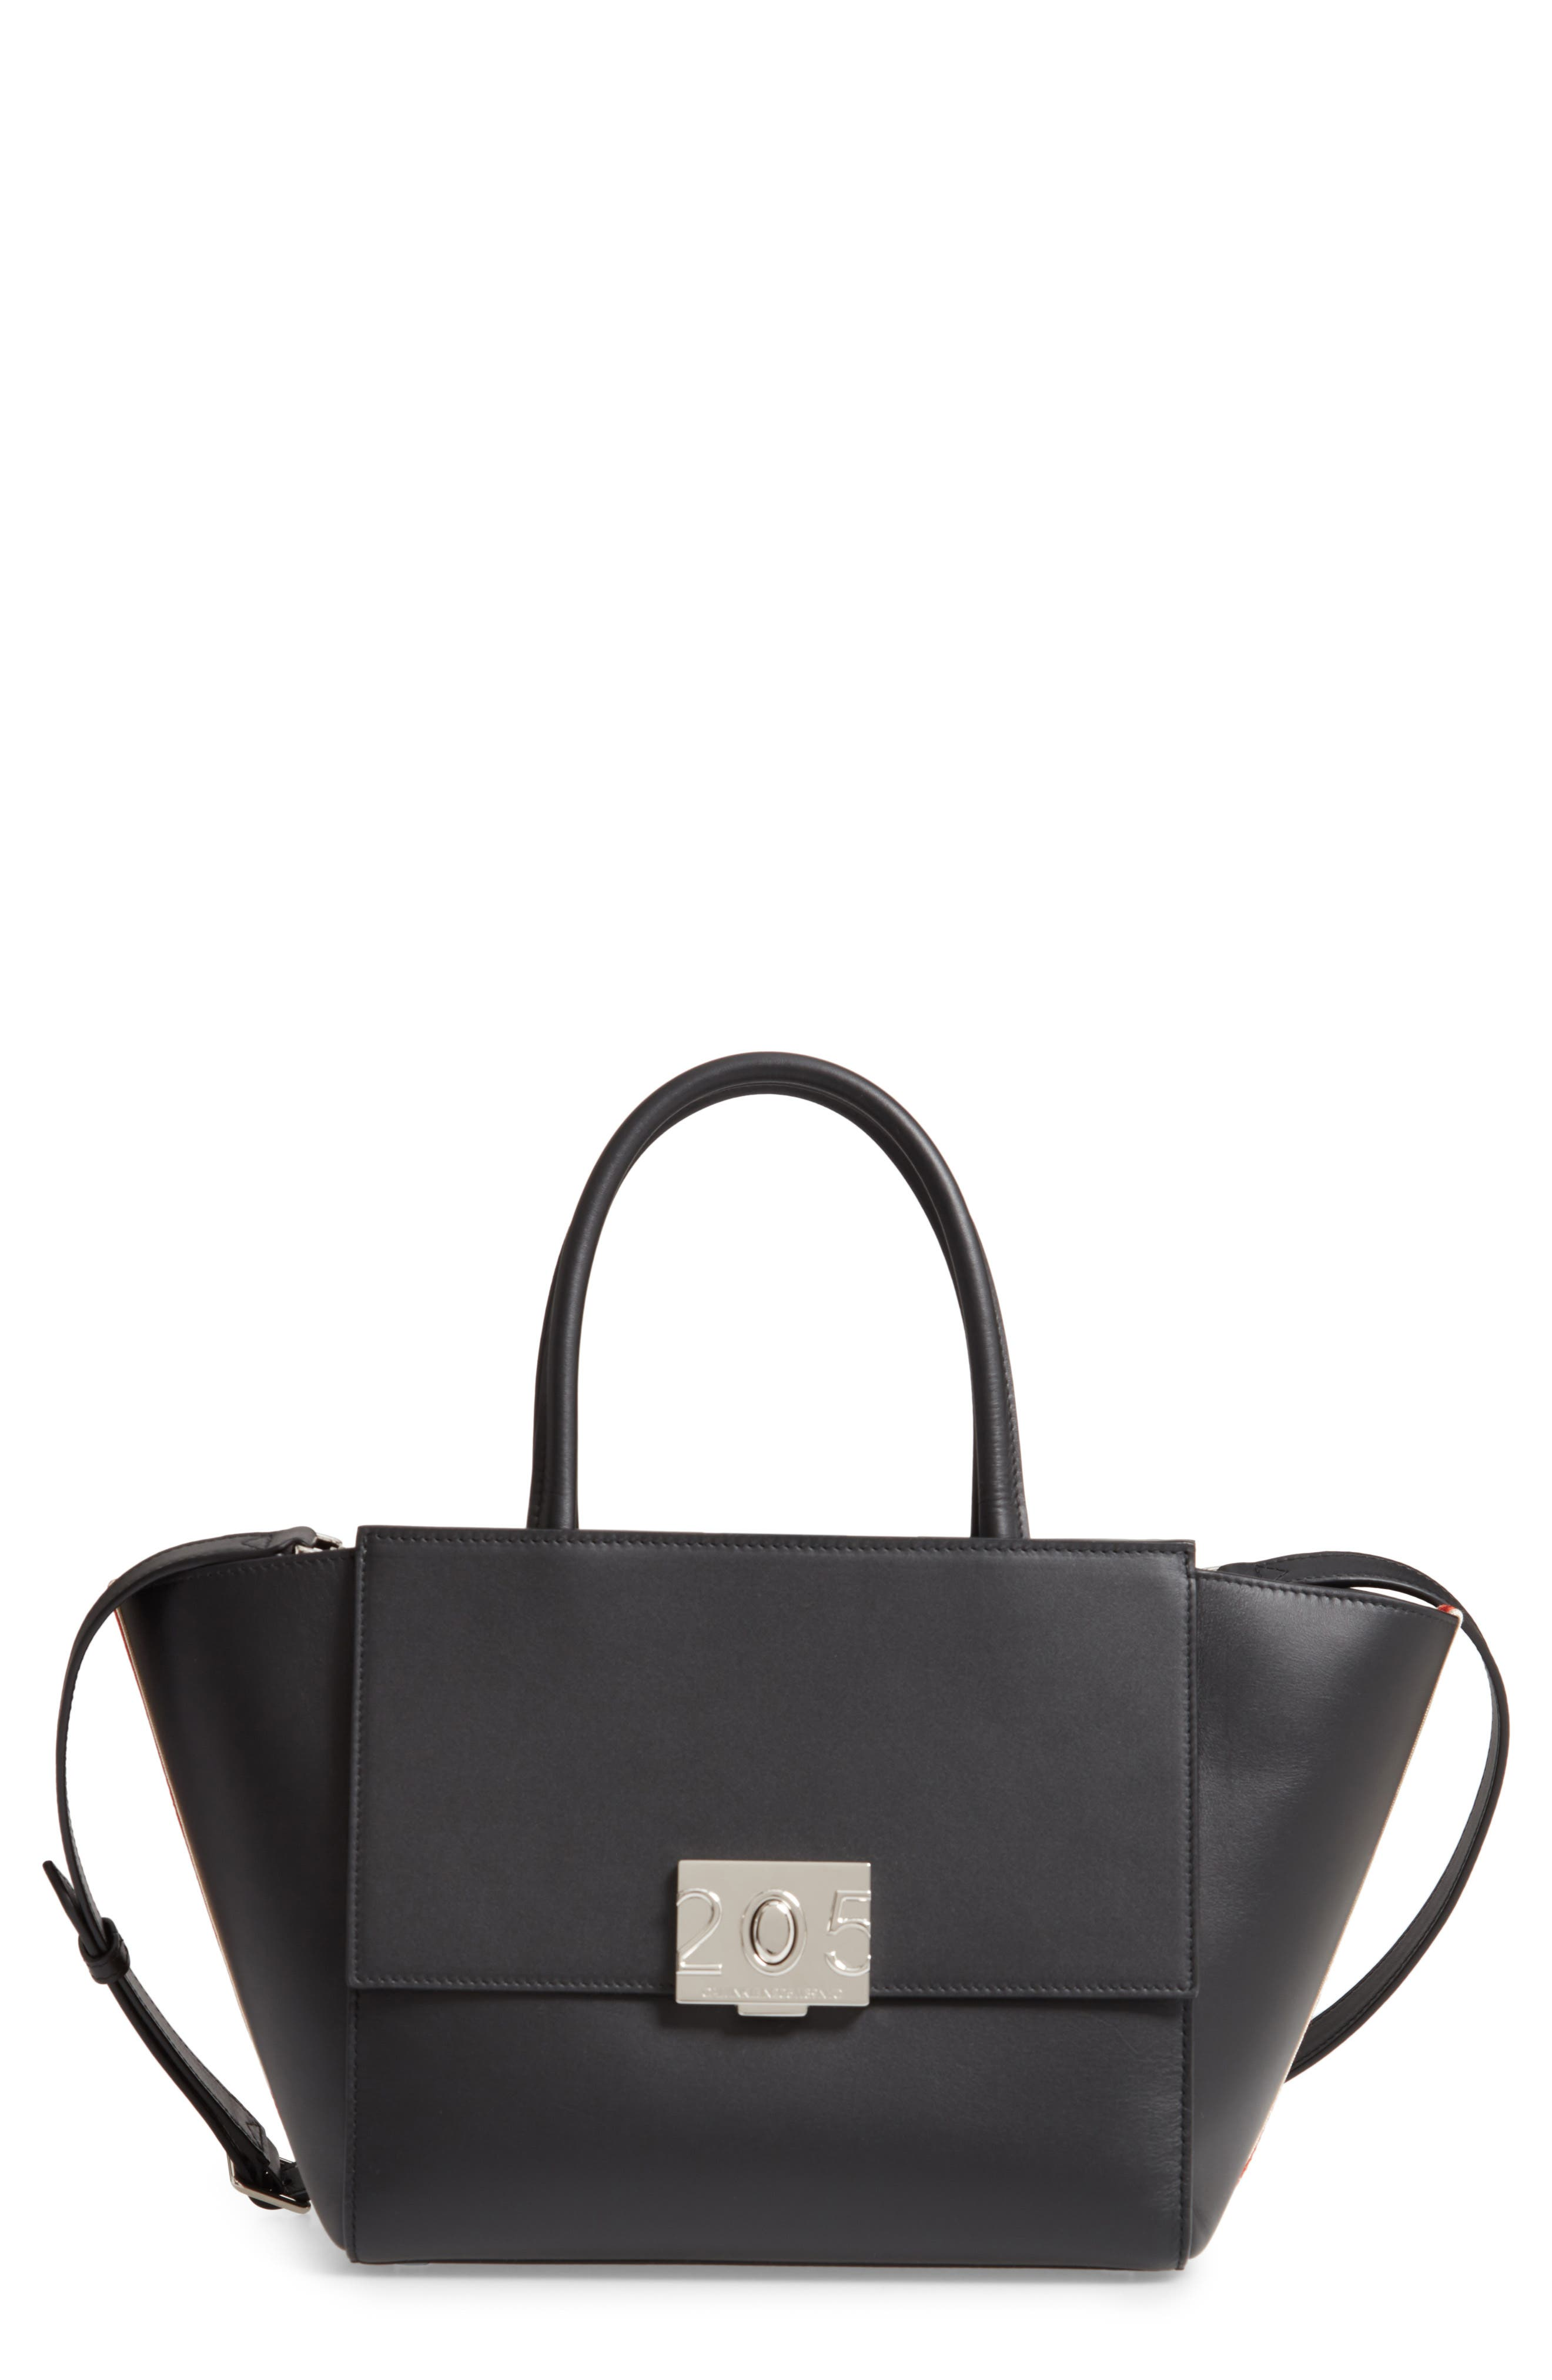 ec819014b5 Calvin Klein 205W39Nyc Bonnie Top Handle Leather Satchel -